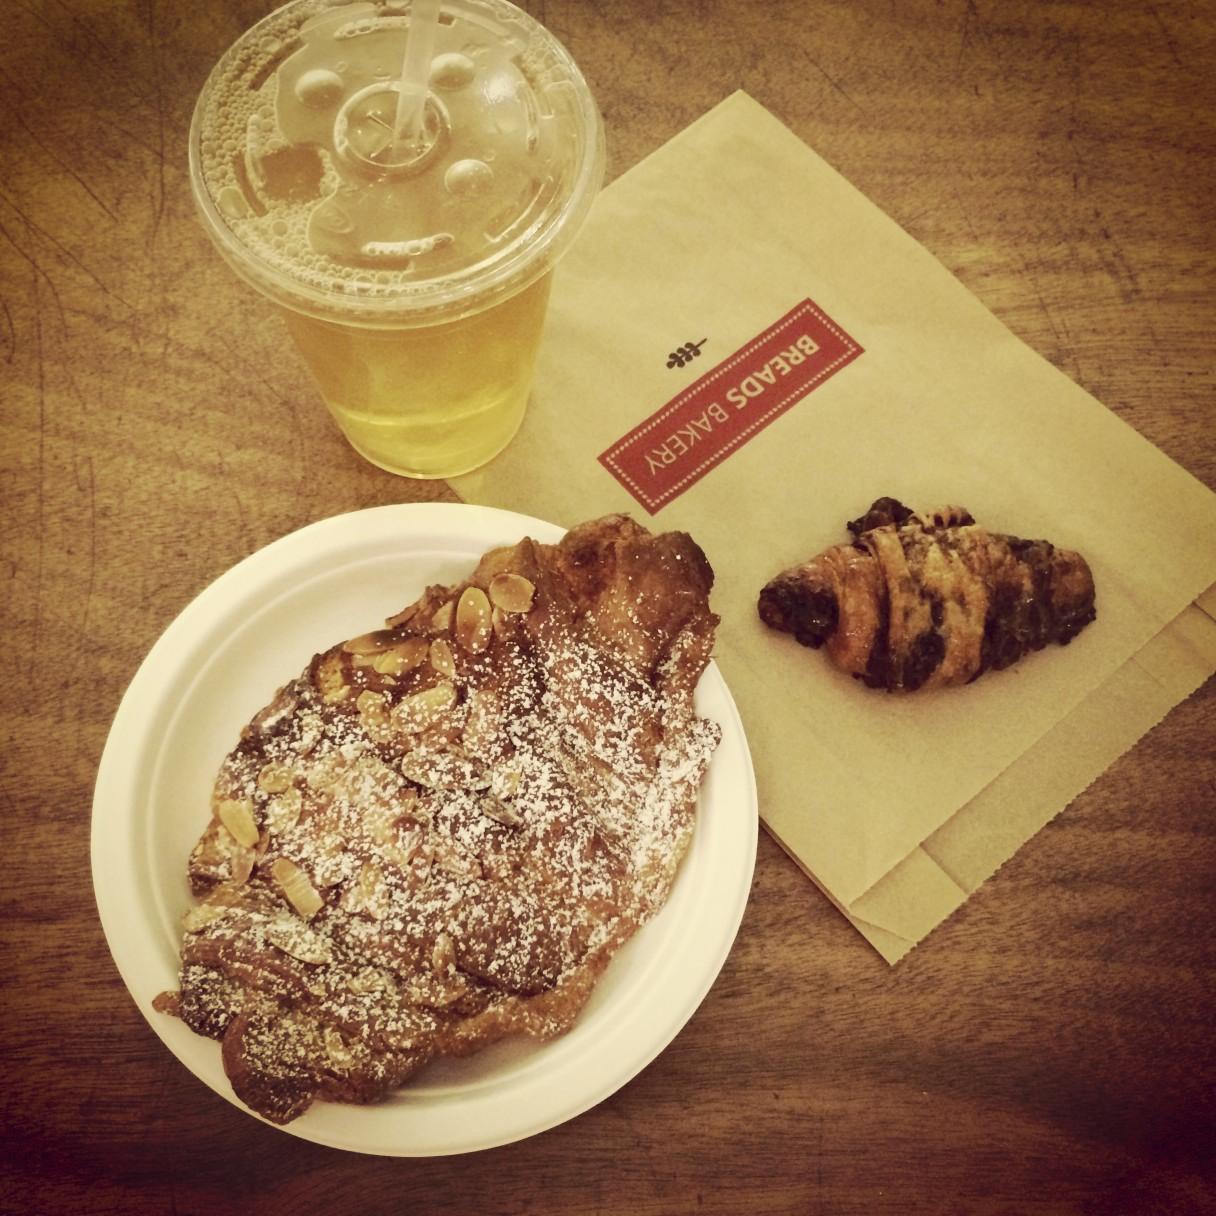 Almond croissant, Rugelach, and a mint ice tea.